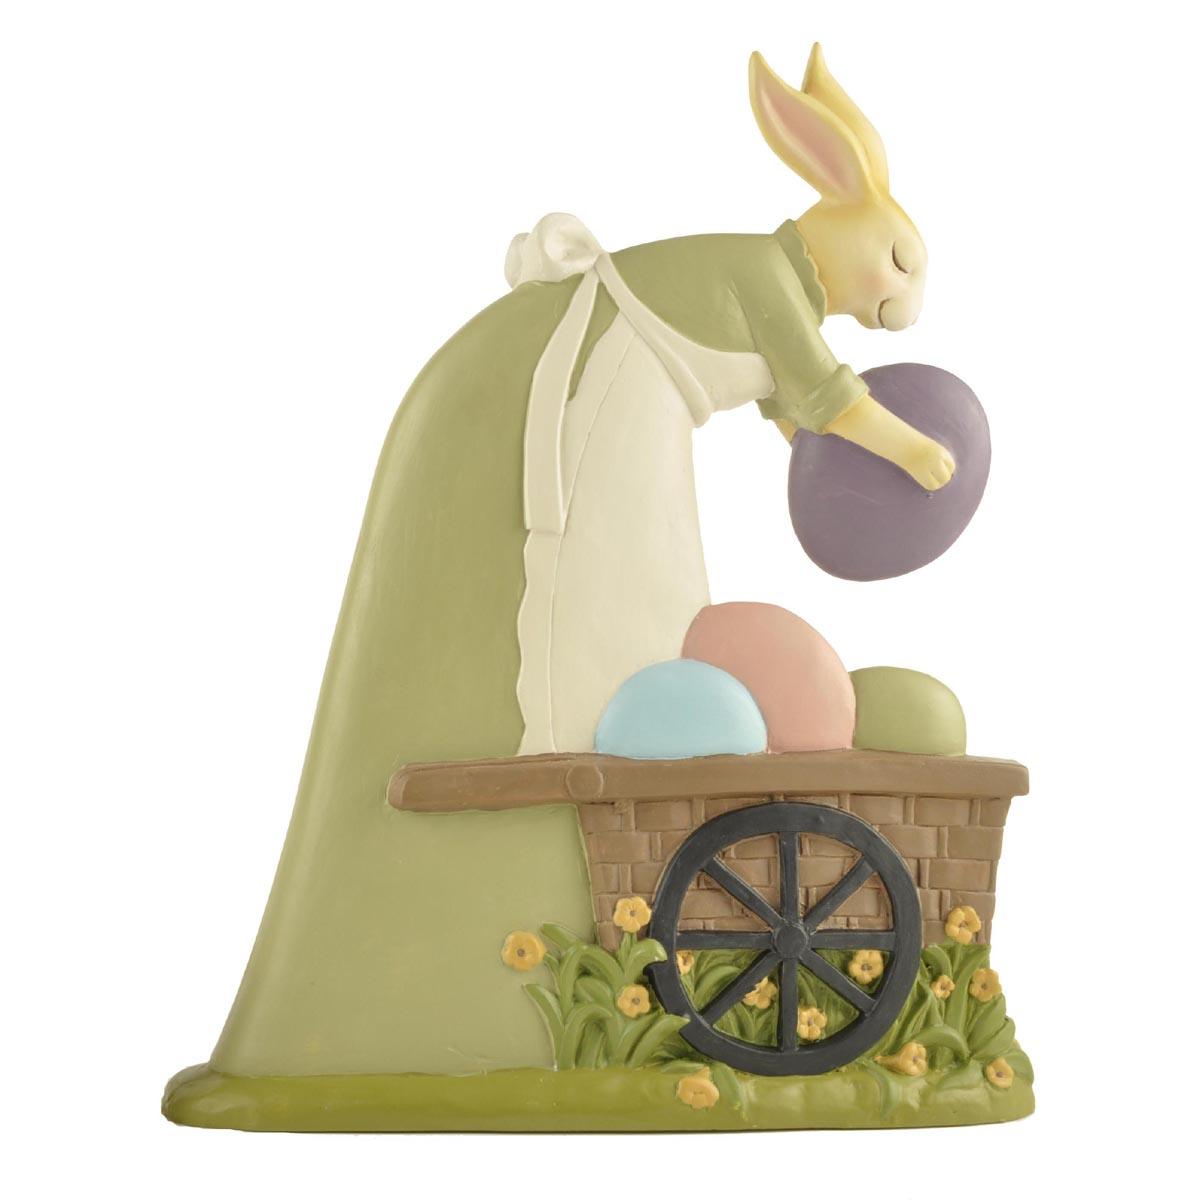 free sample vintage easter bunny figurines oem micro landscape-1